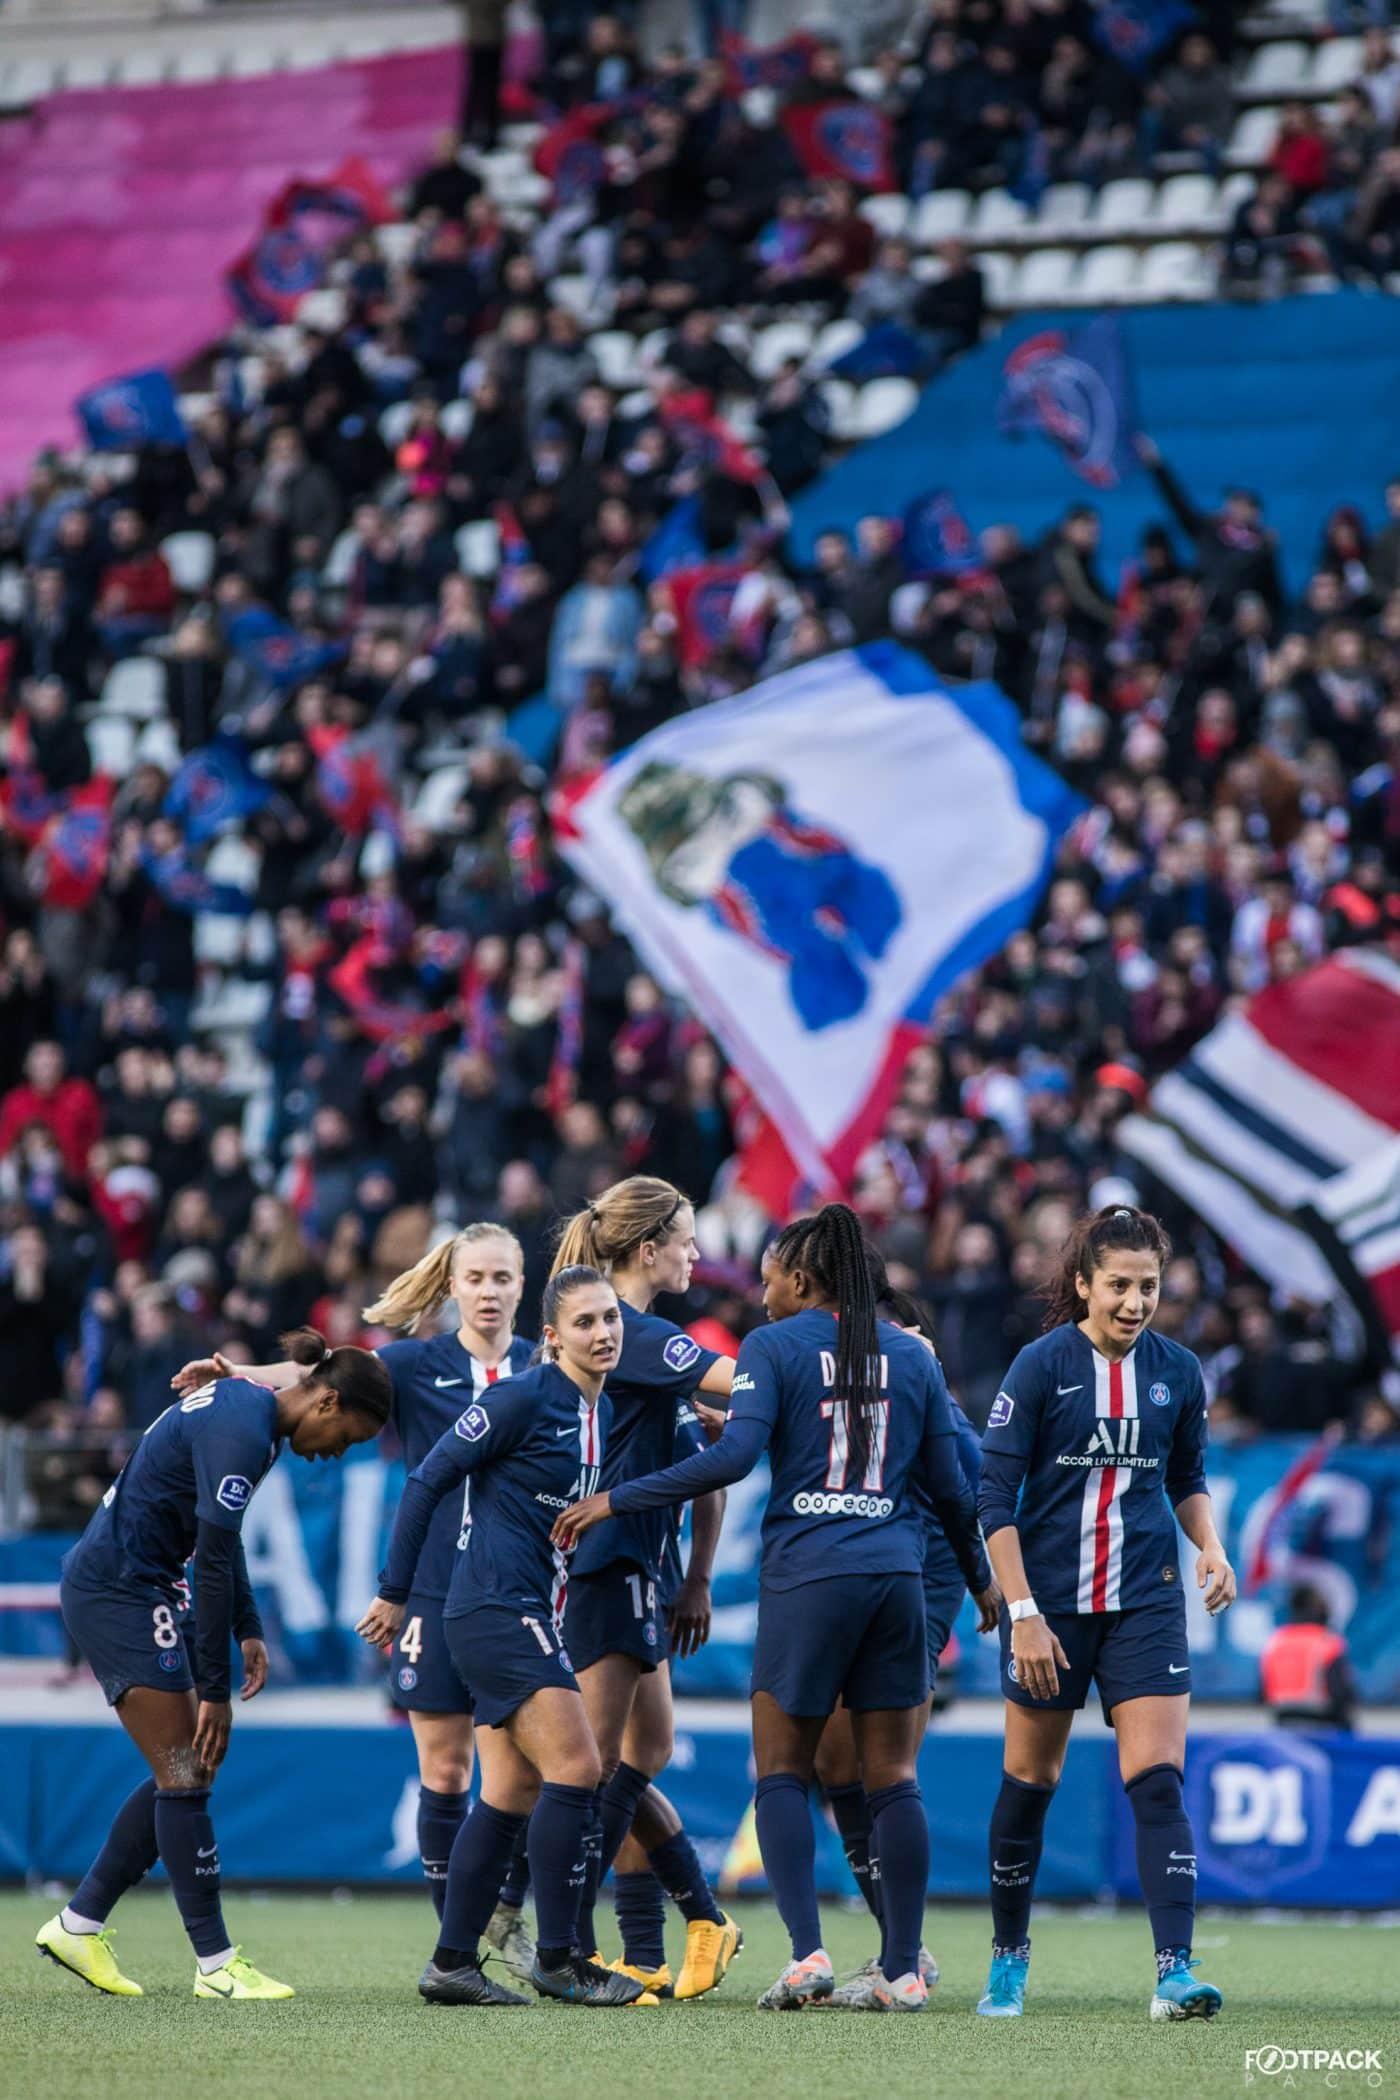 au-stade-paris-saint-germain-psg-olympique-de-marseille-d1-feminine-arkema-footpack-25